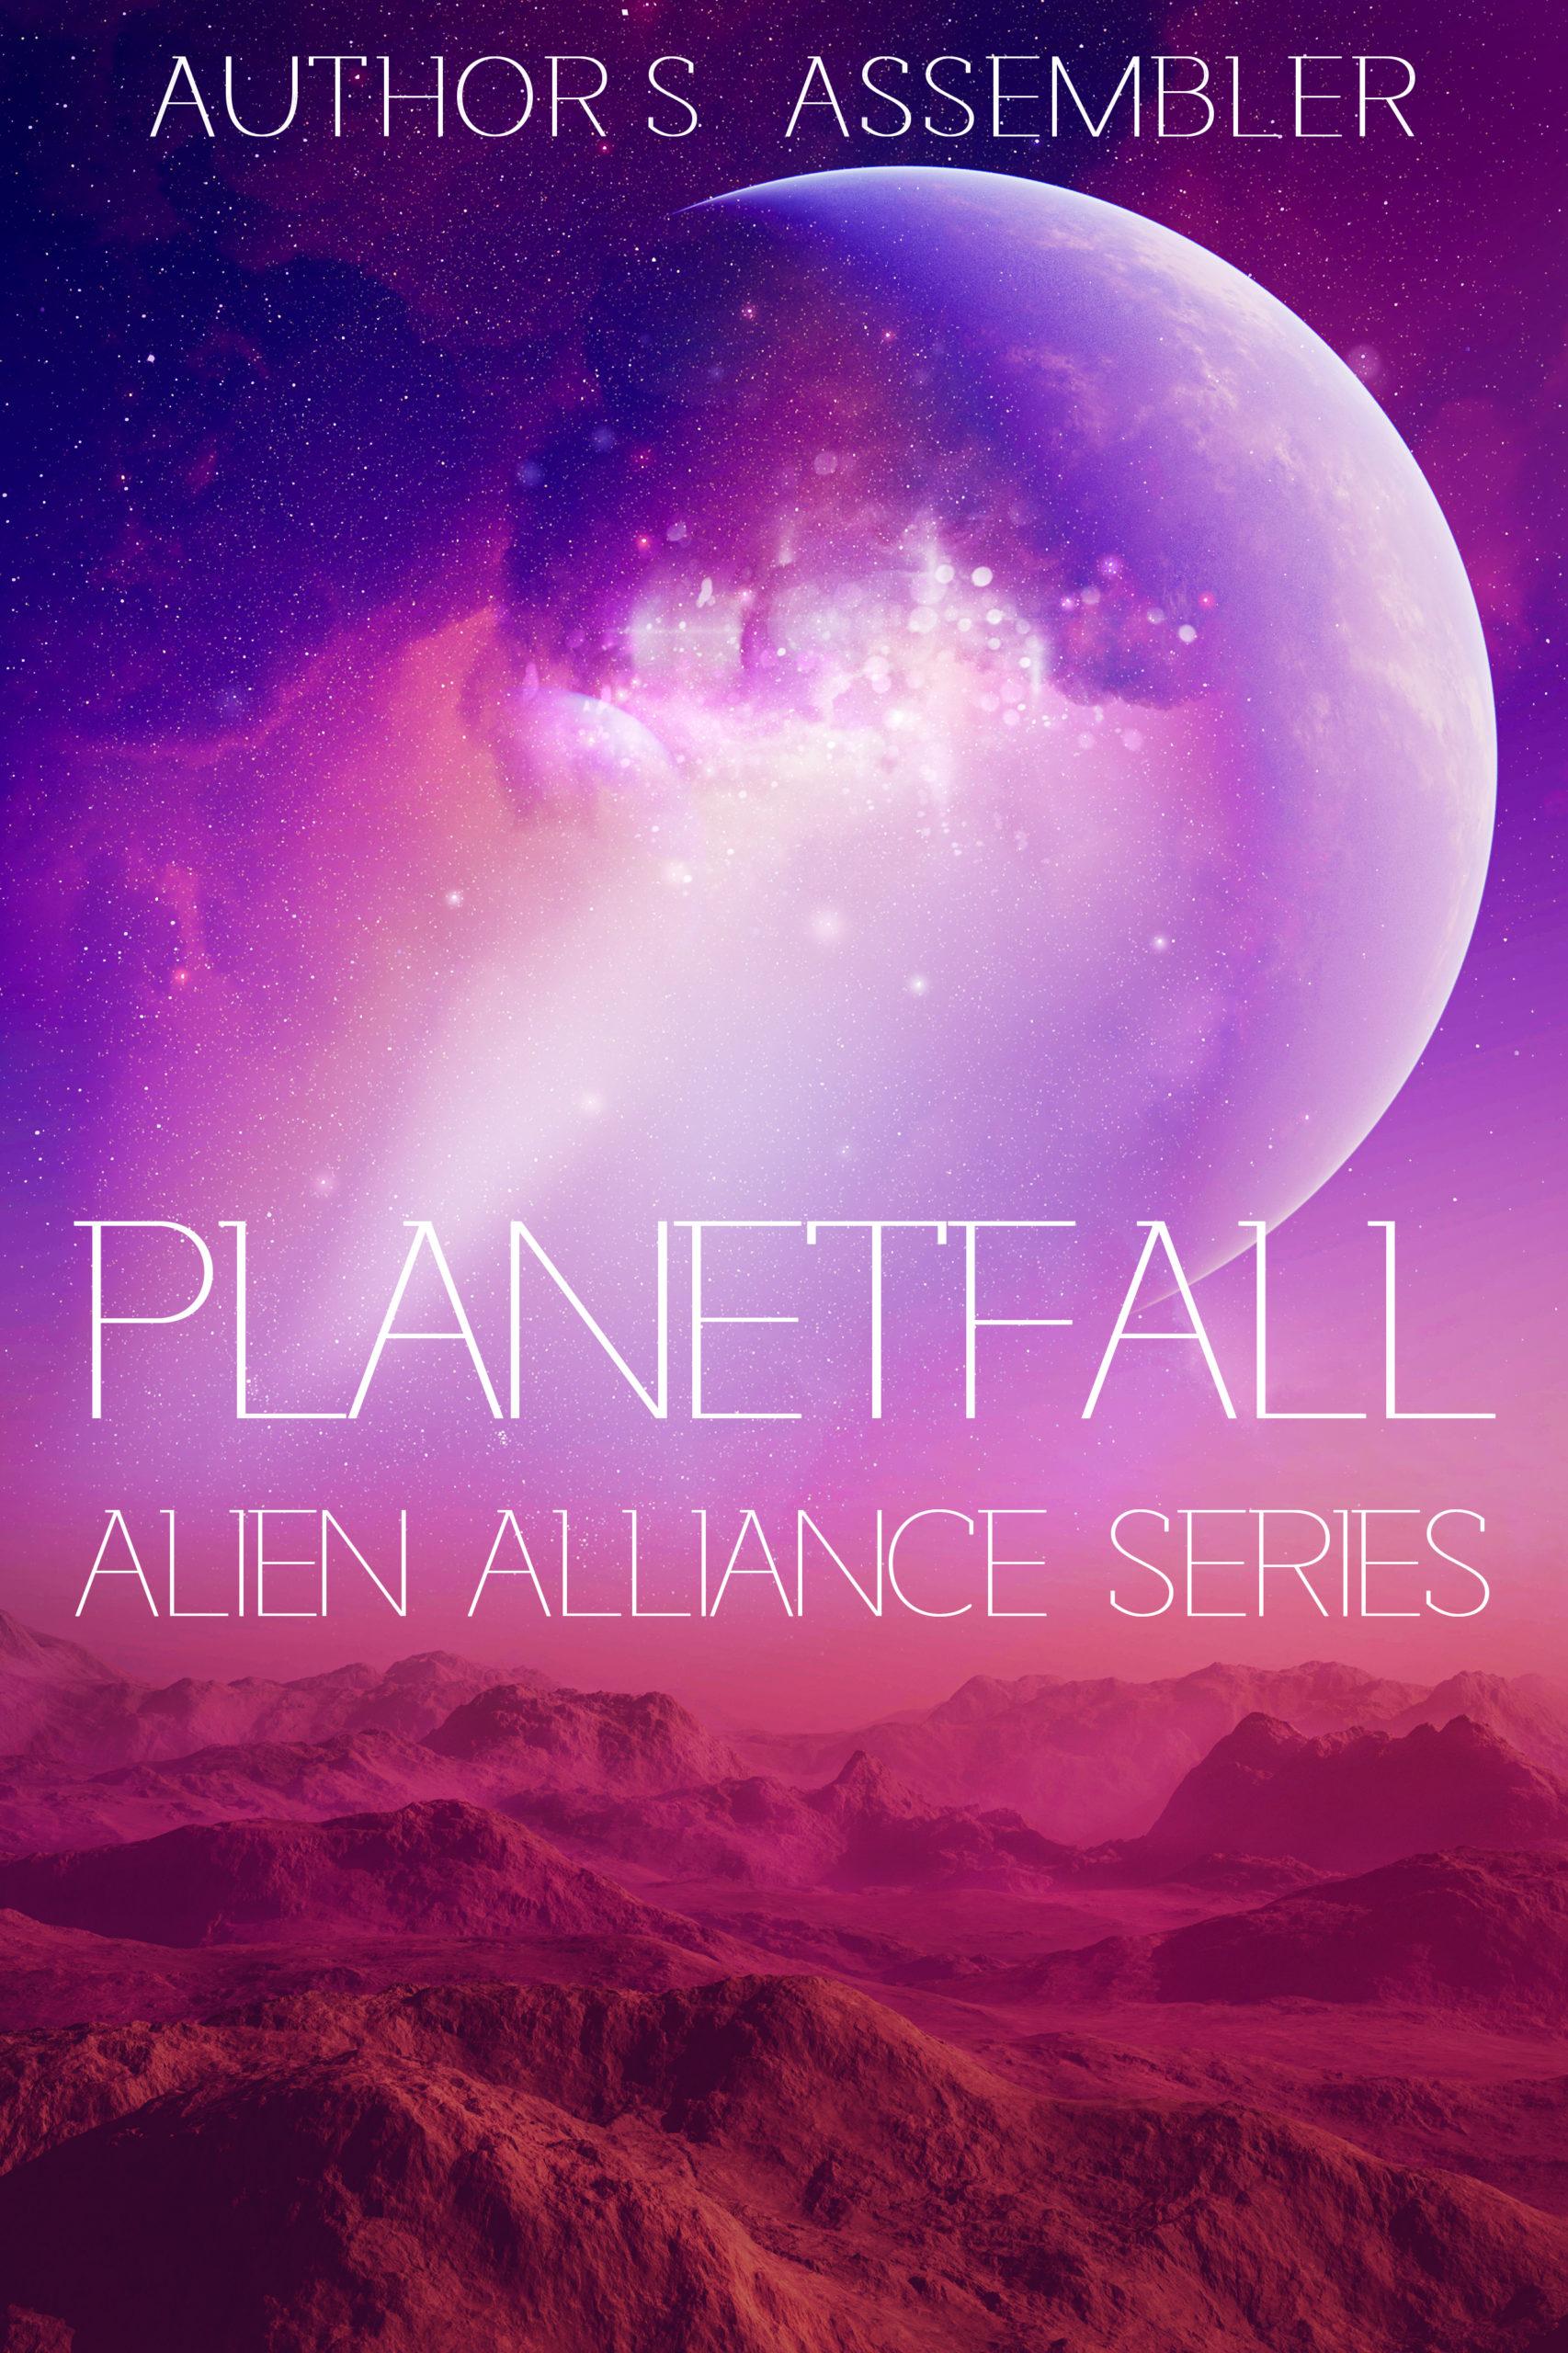 Premade - Planetfall_500x750